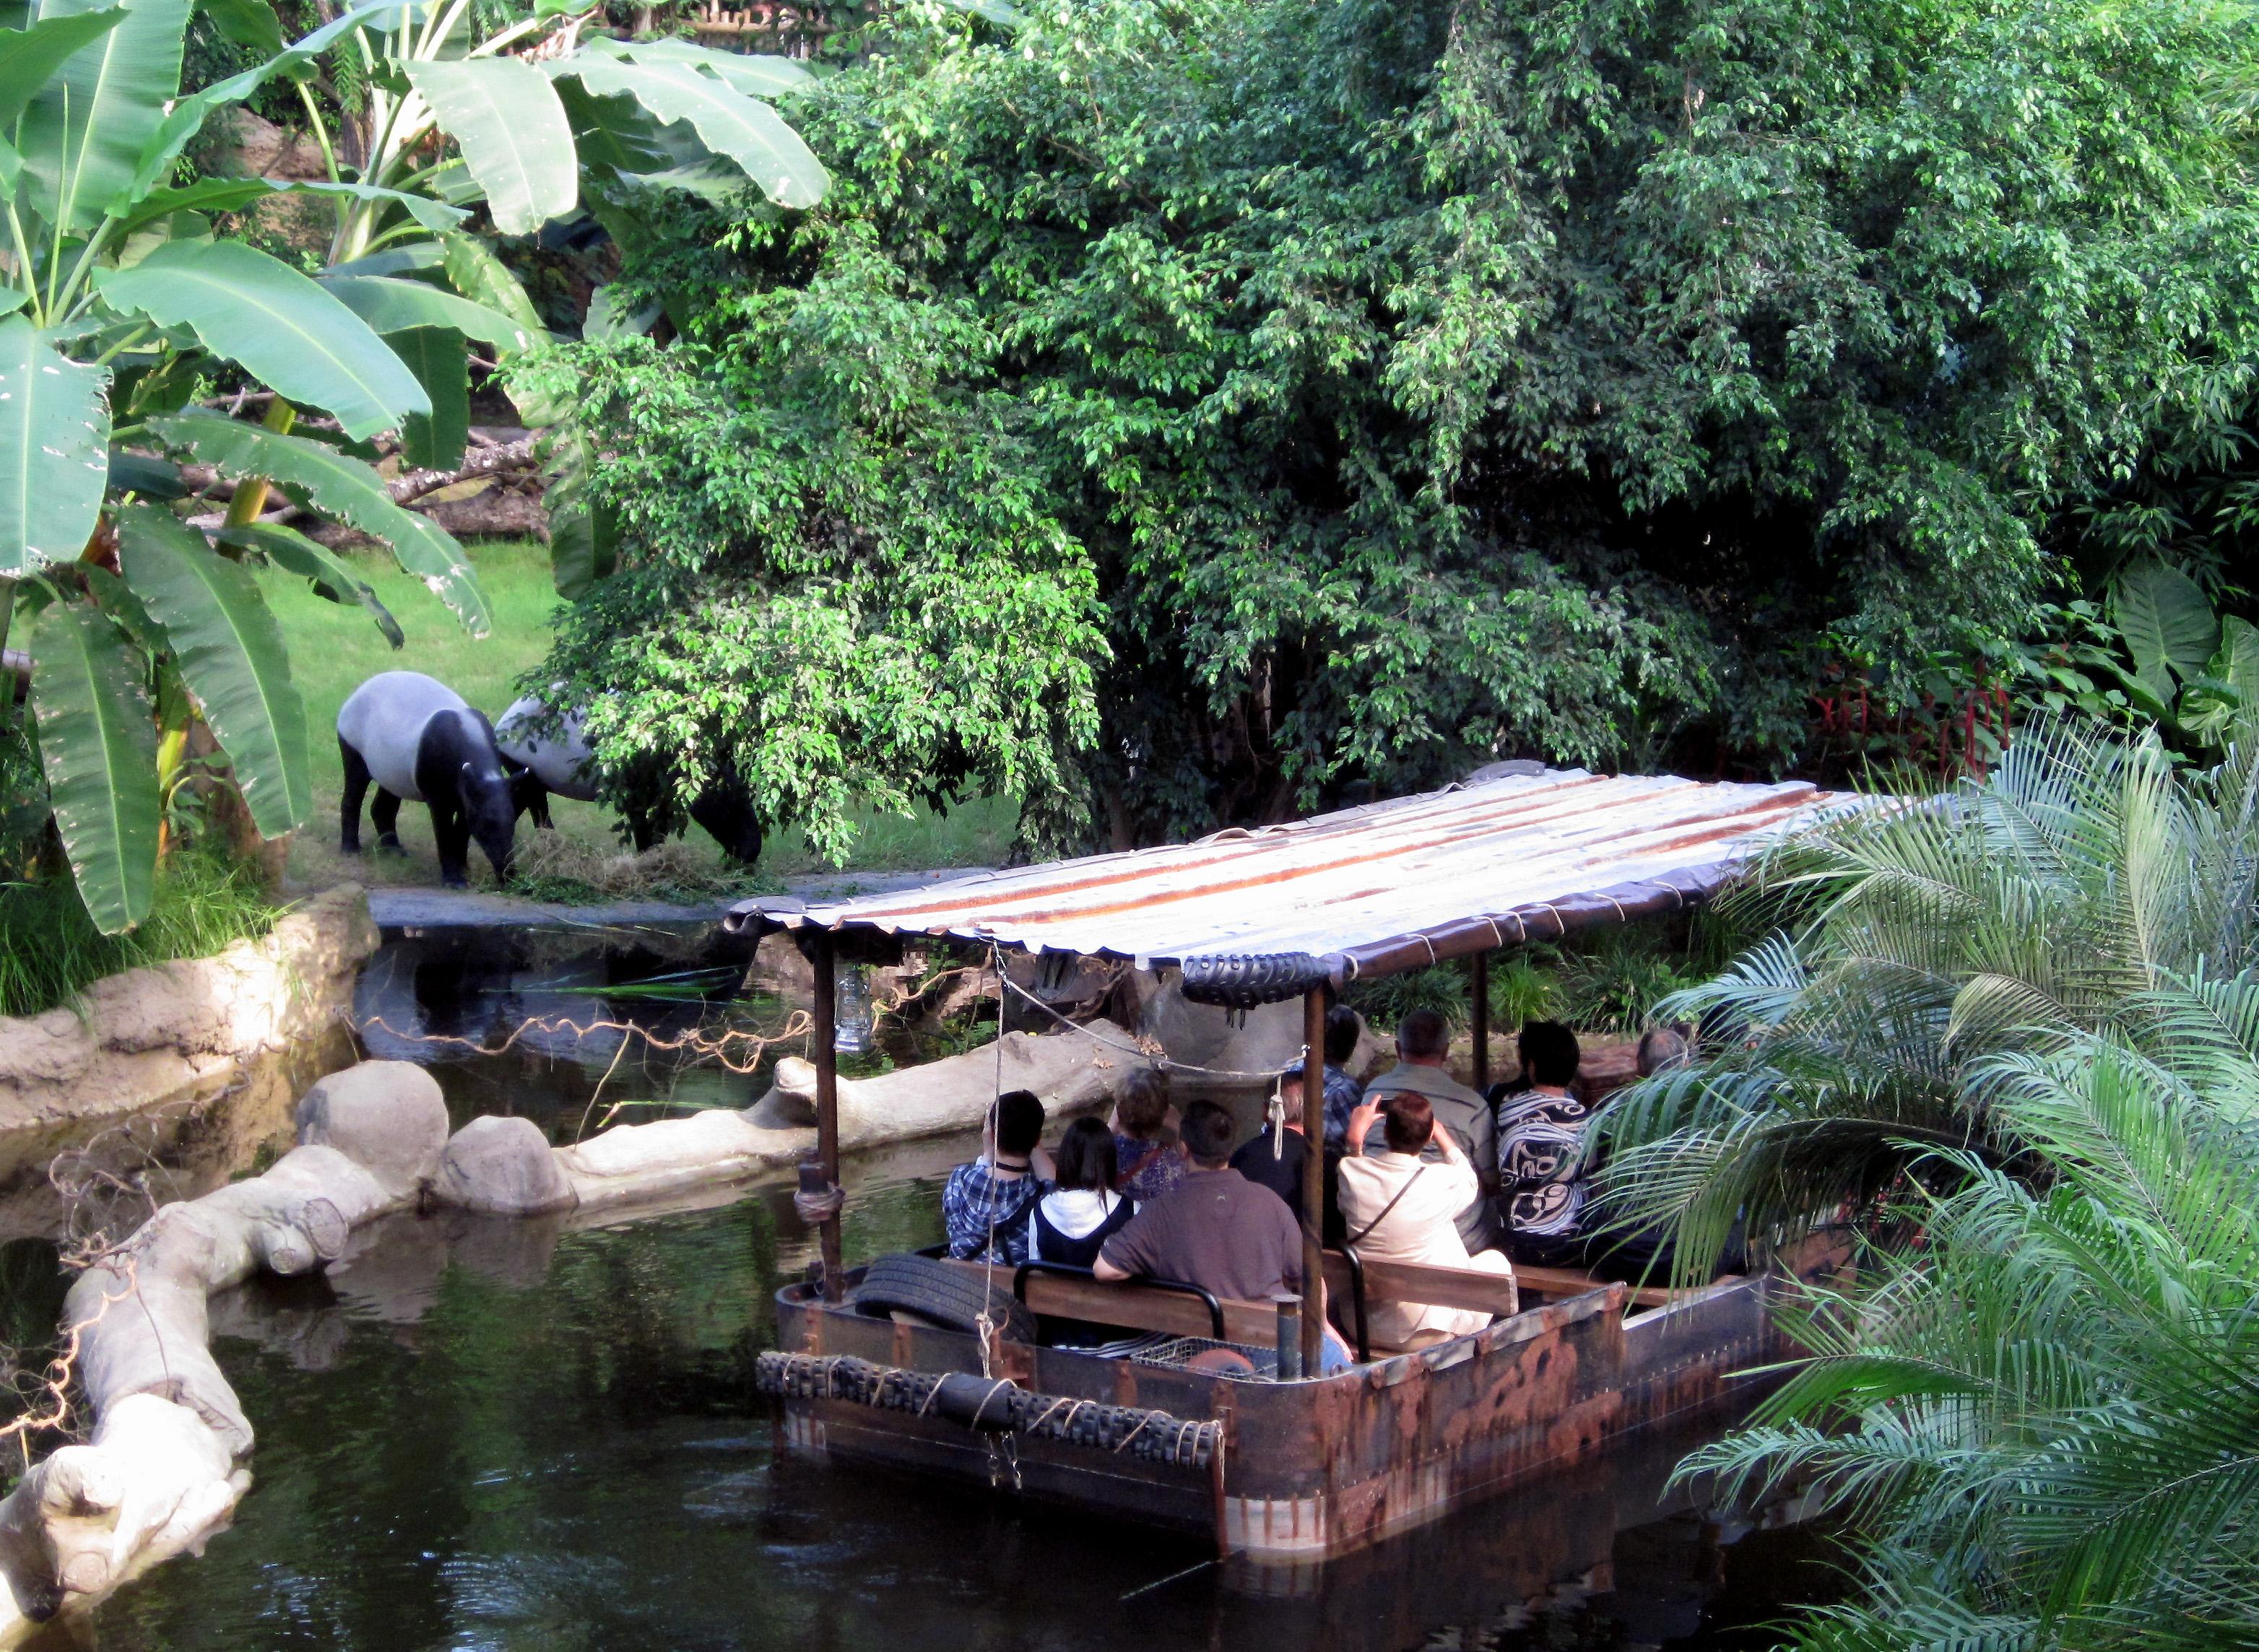 Bootsfahrt duch das Gondwanaland